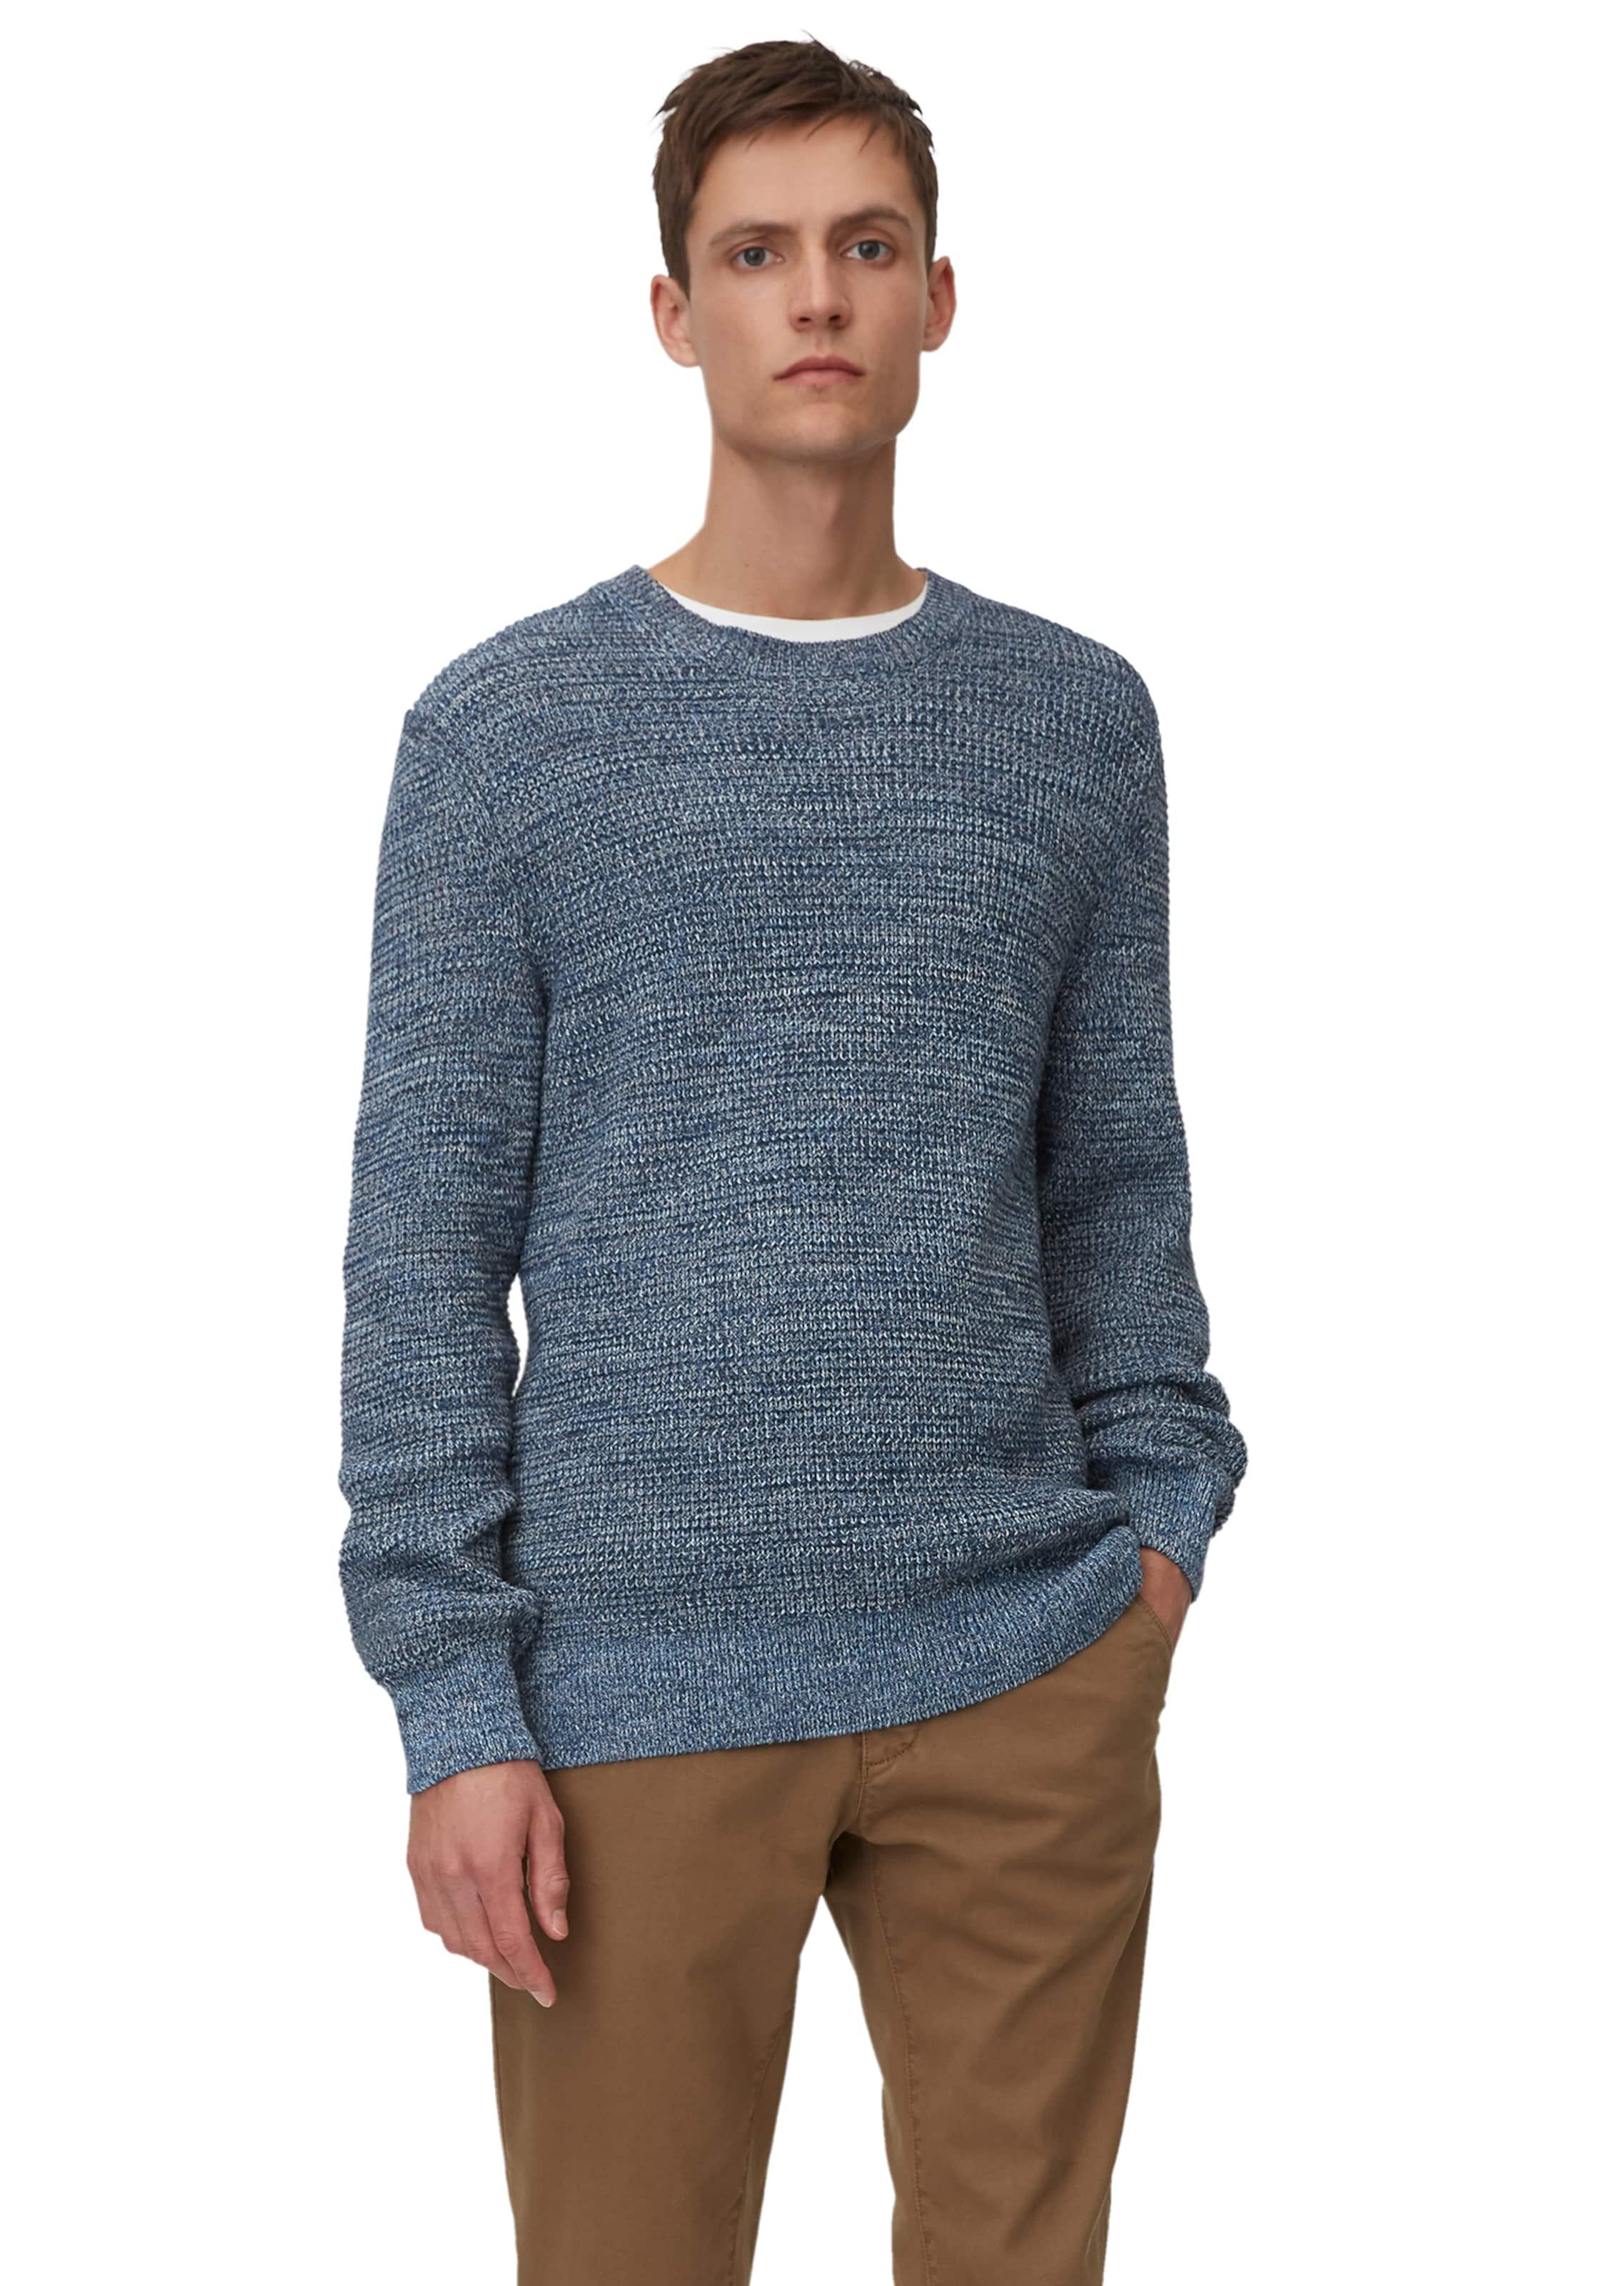 Marc O'Polo Pullover in blaumeliert Textil 7325864588833